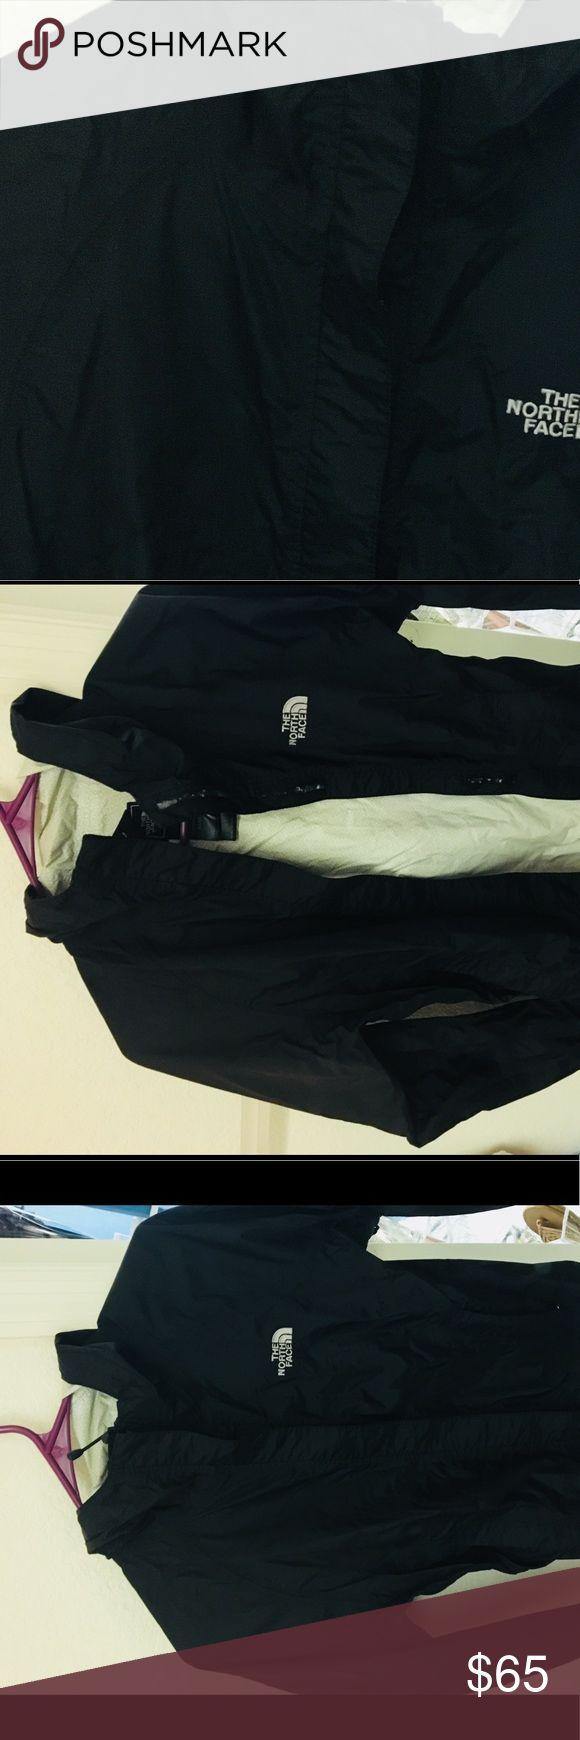 North face jacket Black north face windbreaker/rain jacket North Face Jackets & Coats